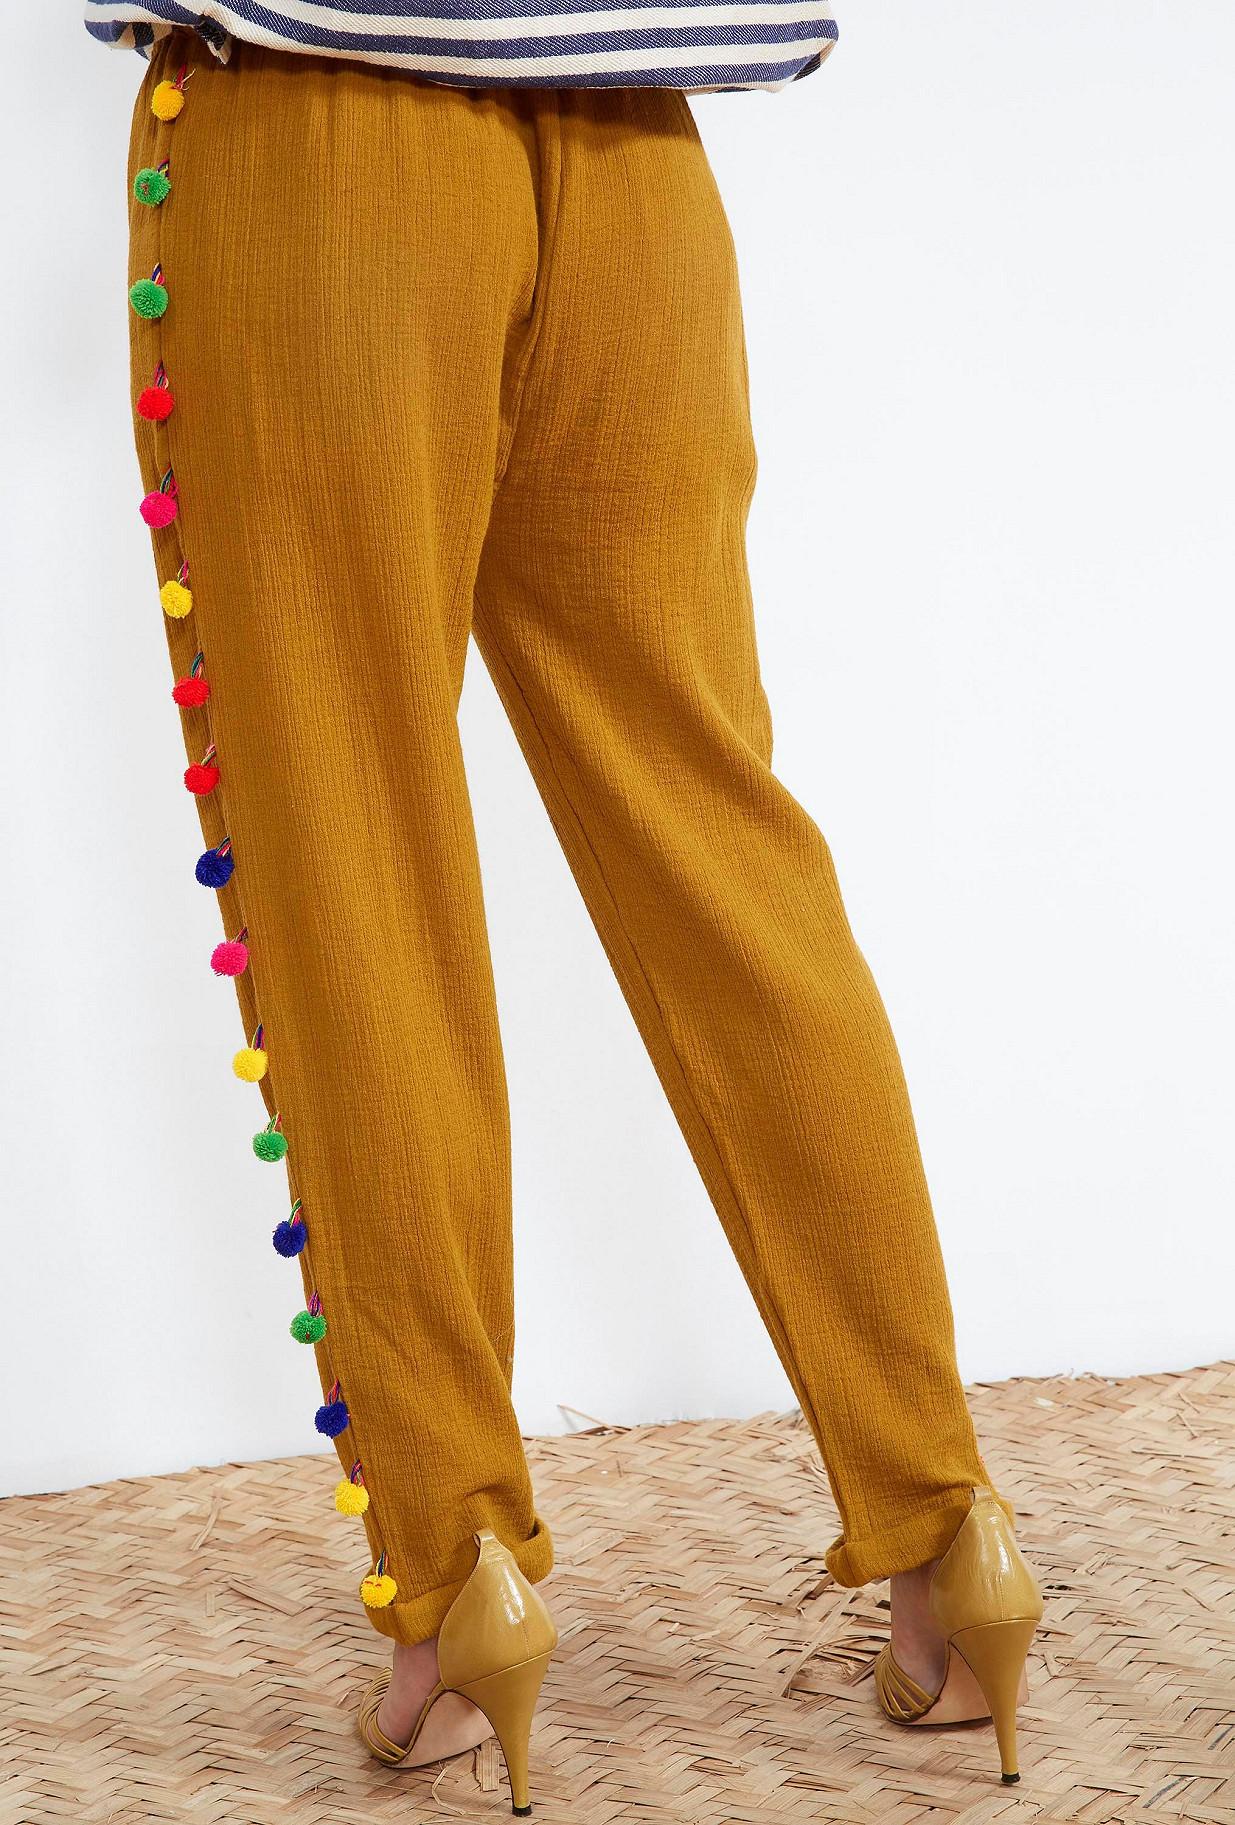 clothes store PANTS  Isba french designer fashion Paris